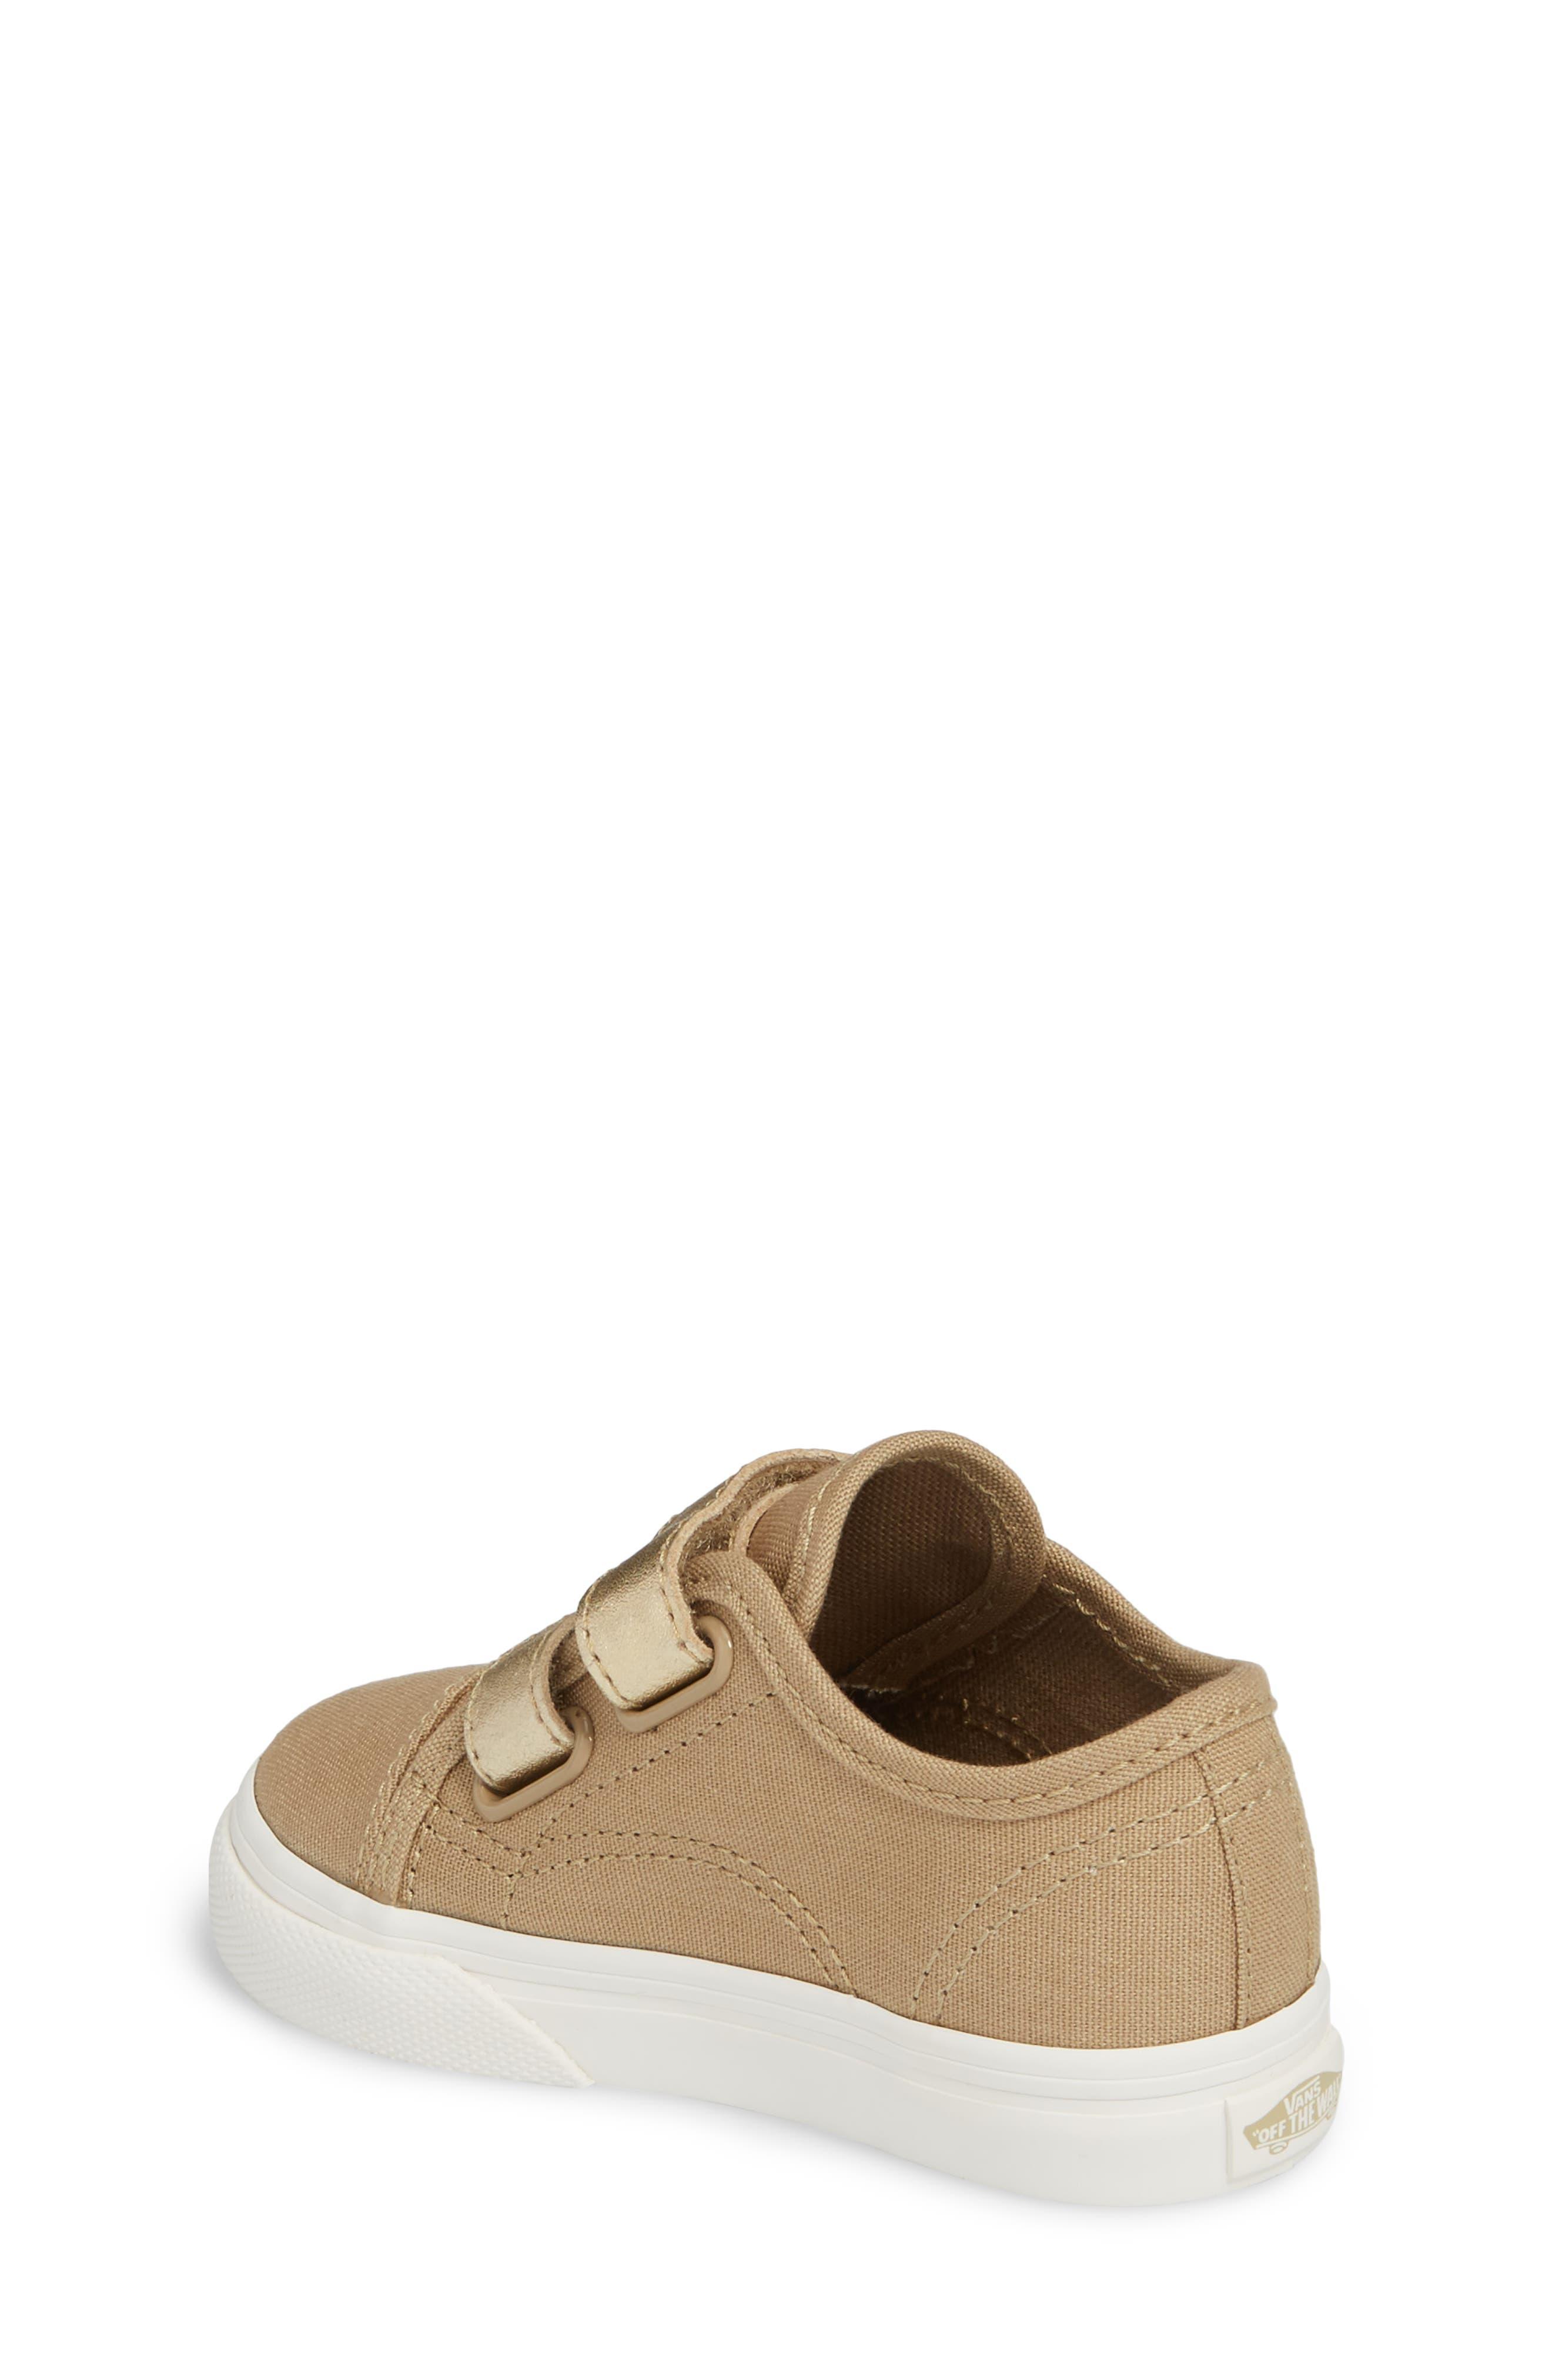 Style 23 V Sneaker,                             Alternate thumbnail 2, color,                             Metallic/ Cornstalk